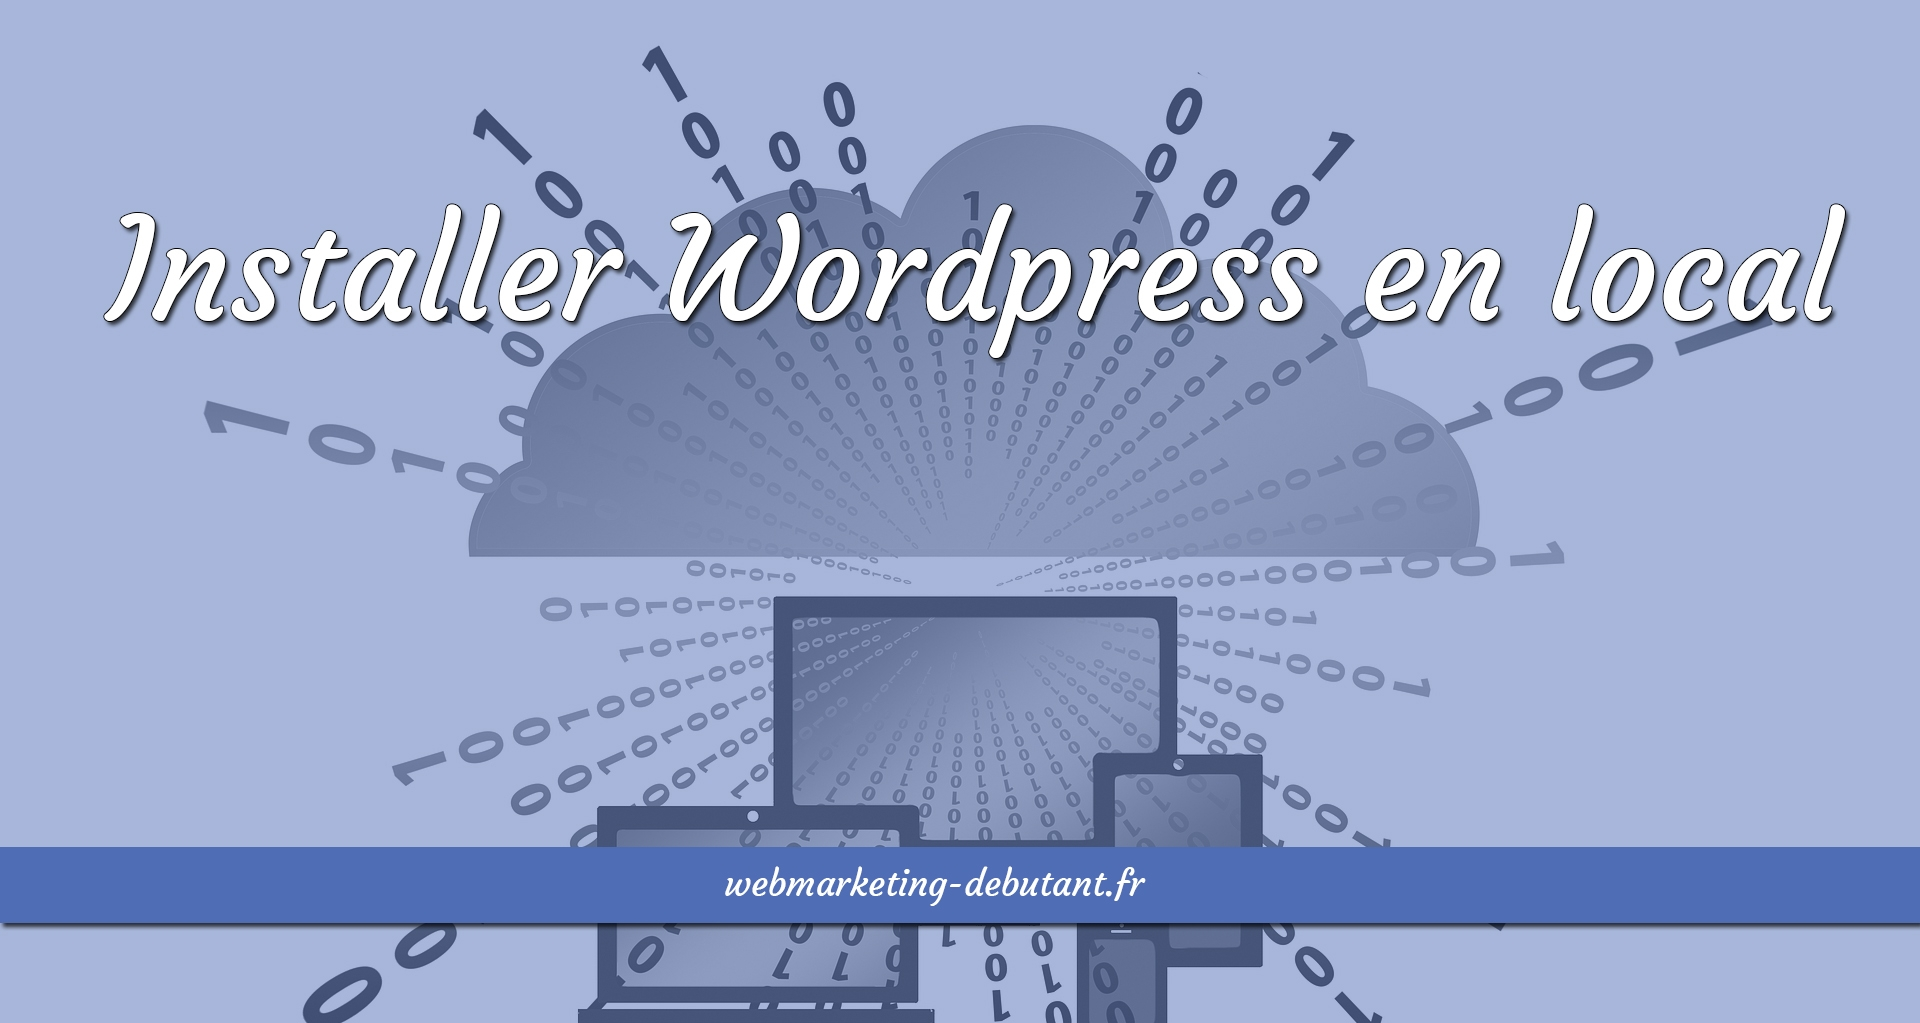 Installer Wordpress en local - la méthode complète avec wamp server